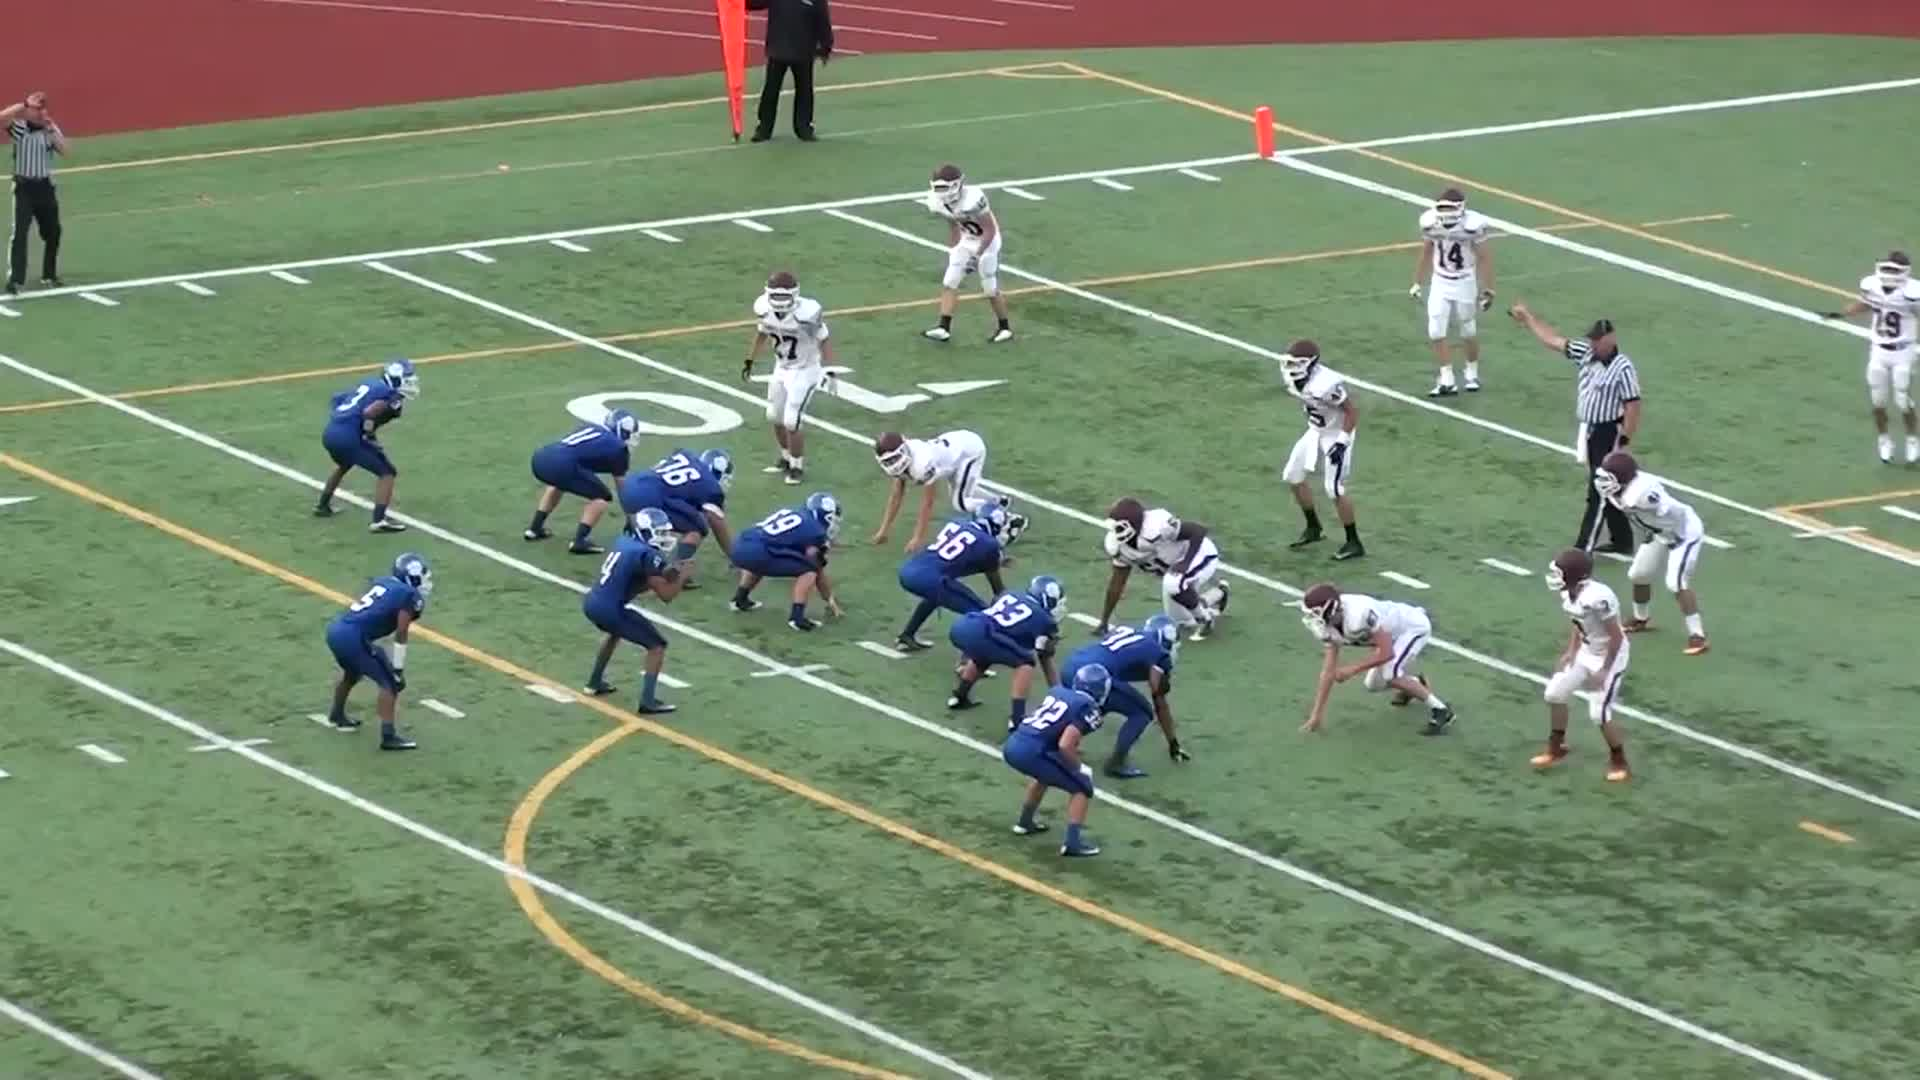 2013 Stadium Tigers - Stadium High School highlights - Hudl